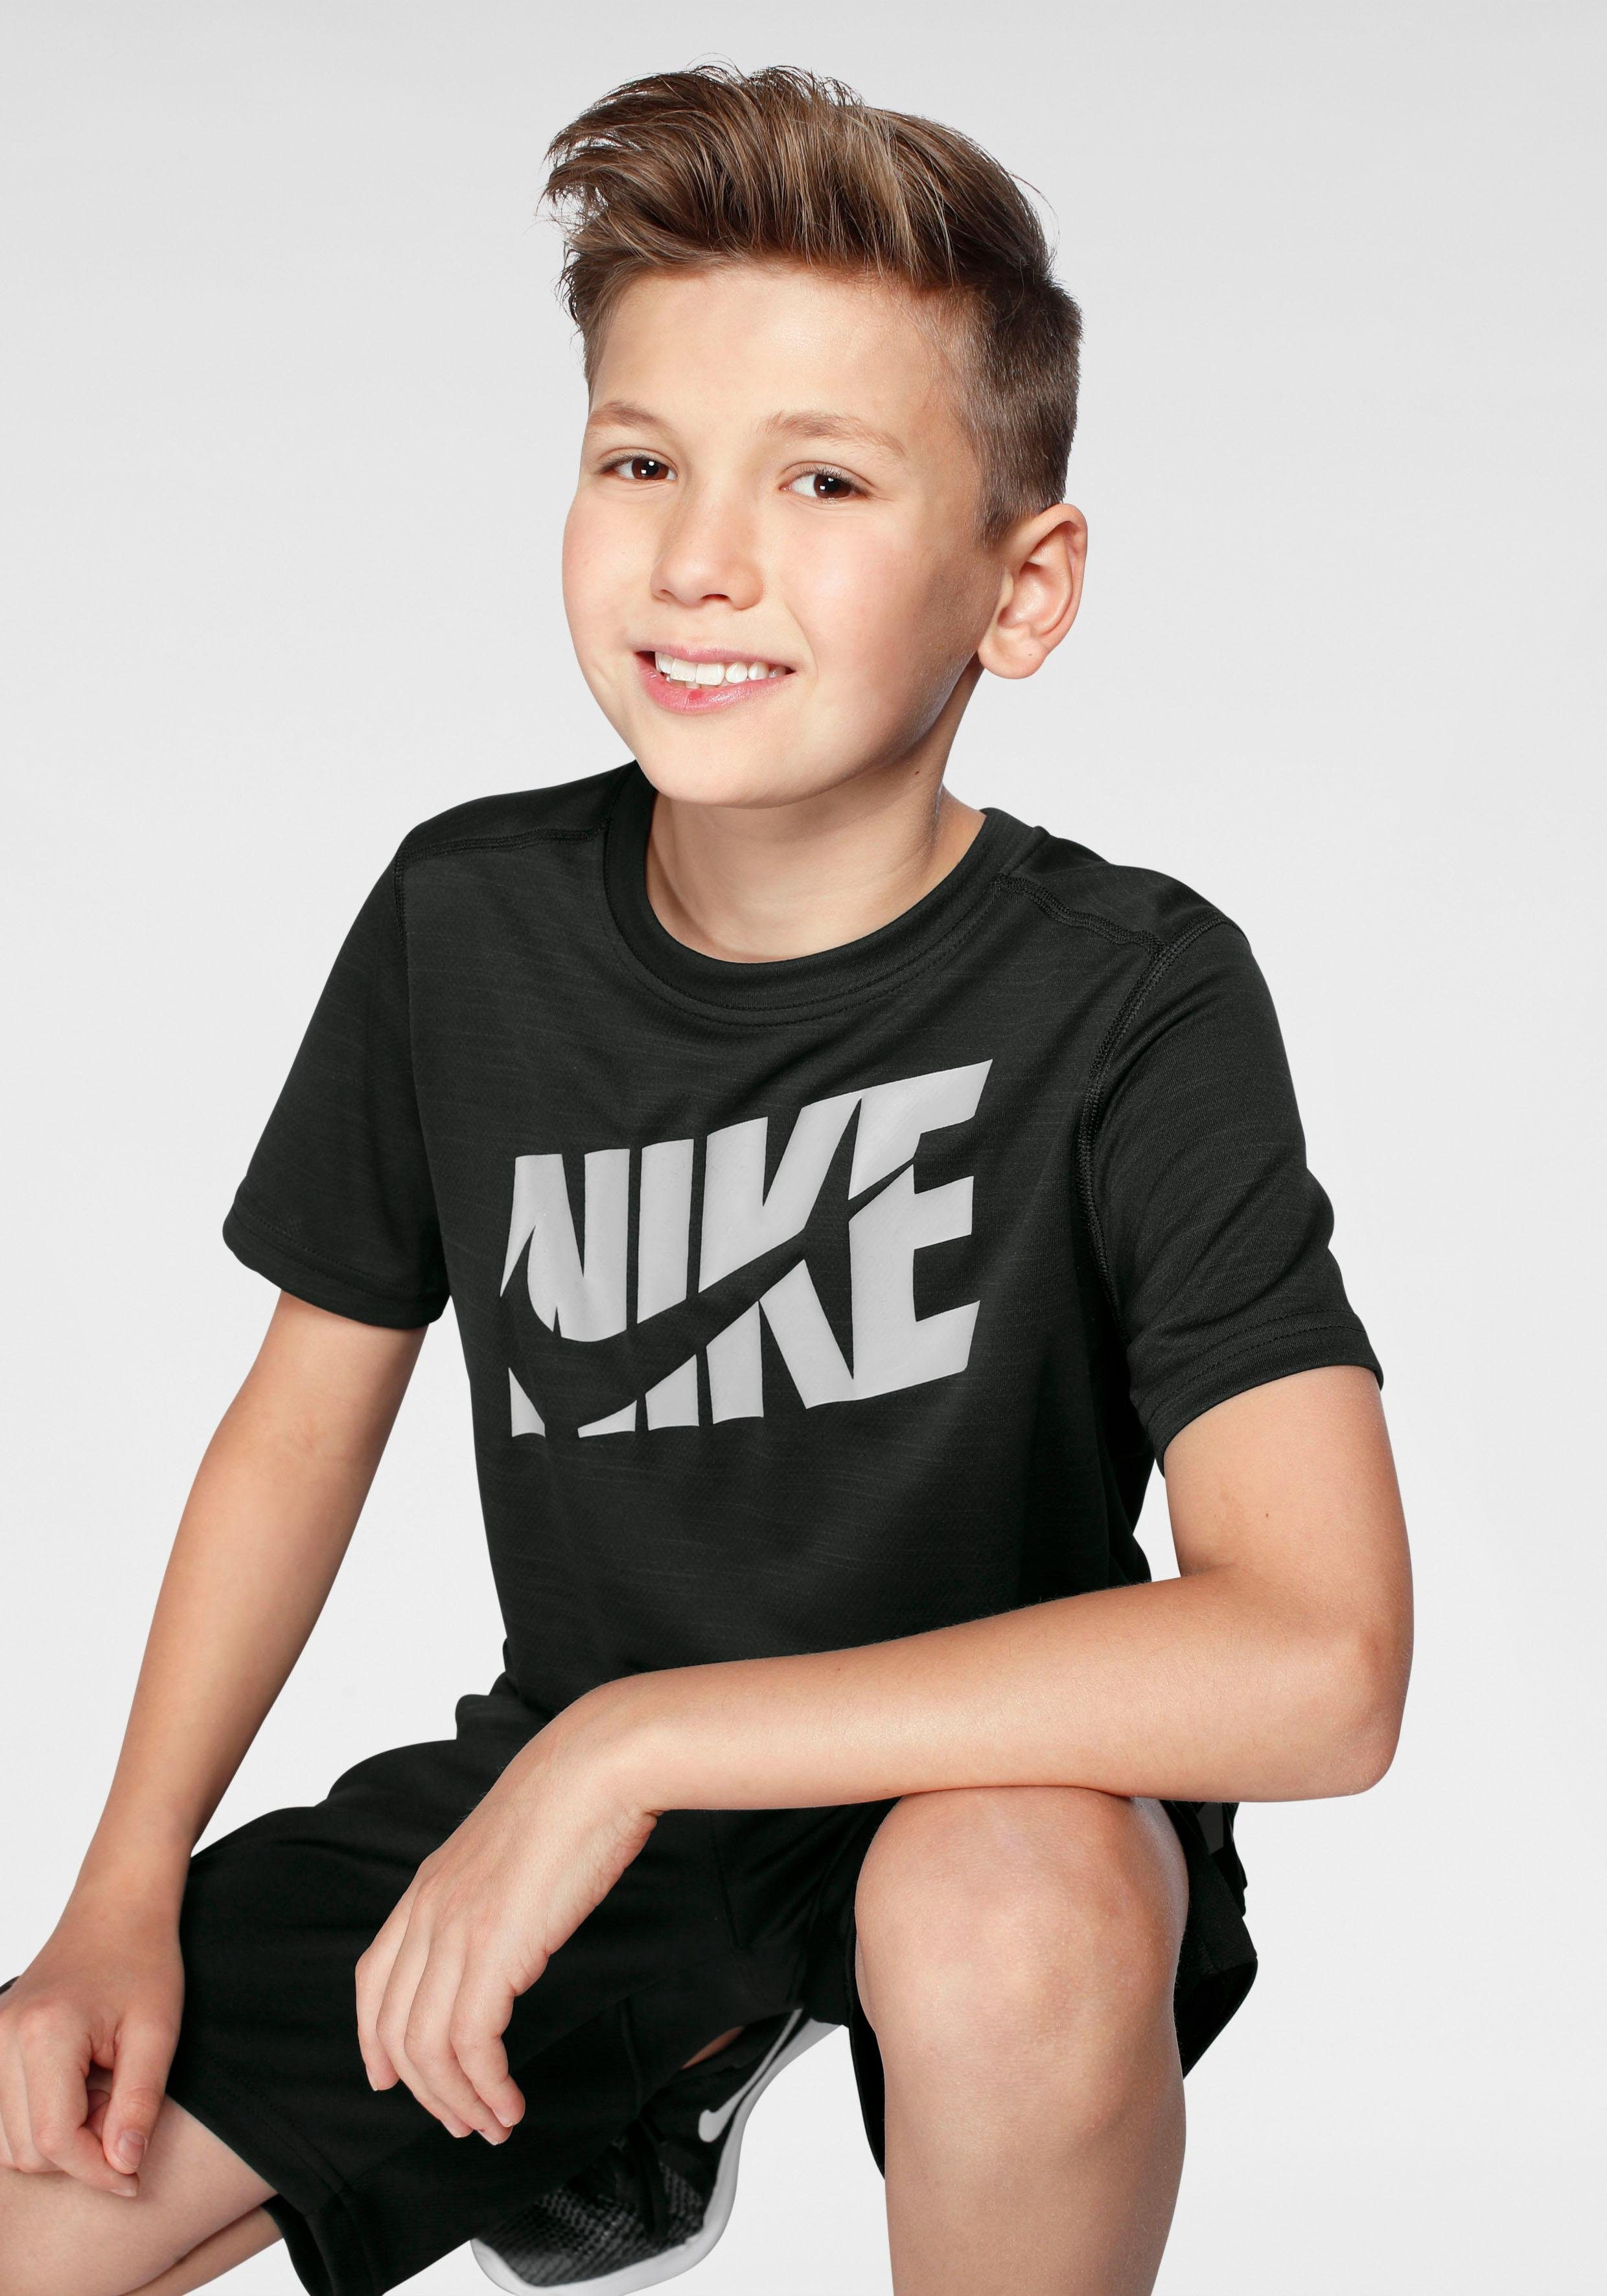 Herren,  Kinder Nike Trainingsshirt »Big Kids Boys Short-Sleeve Training Top«    00193654693190